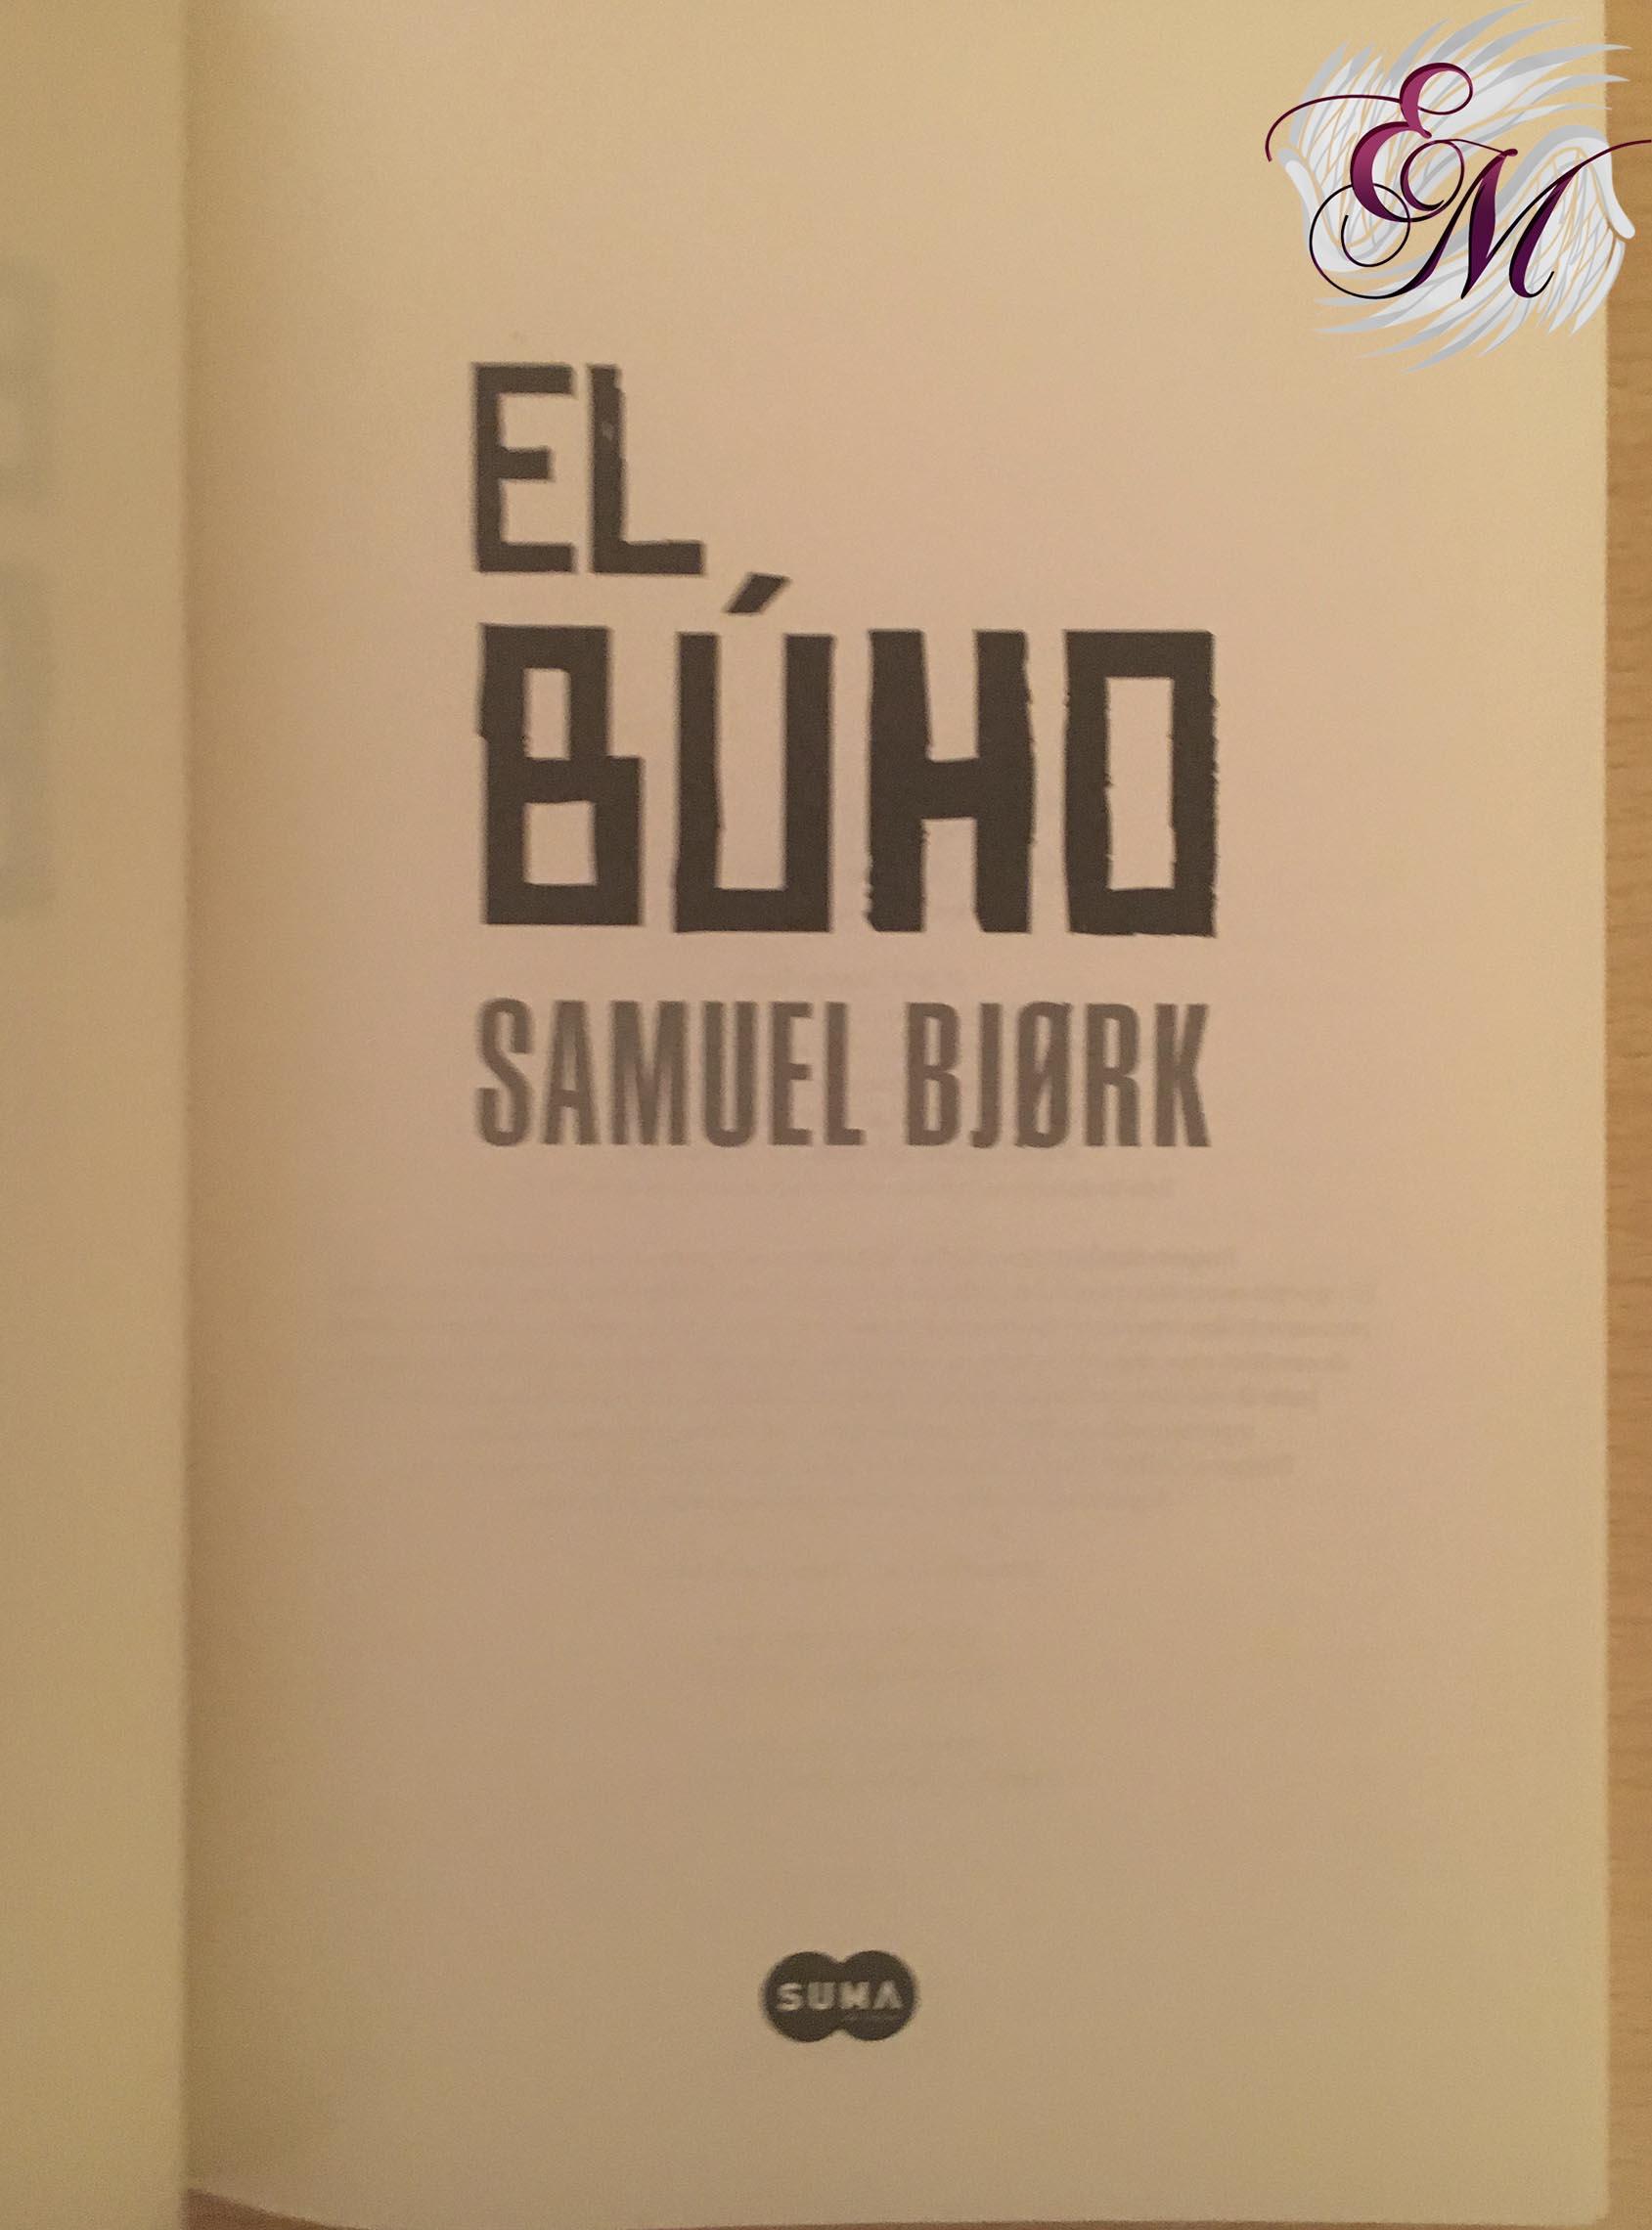 El búho, de Samuel Bjørk - Reseña